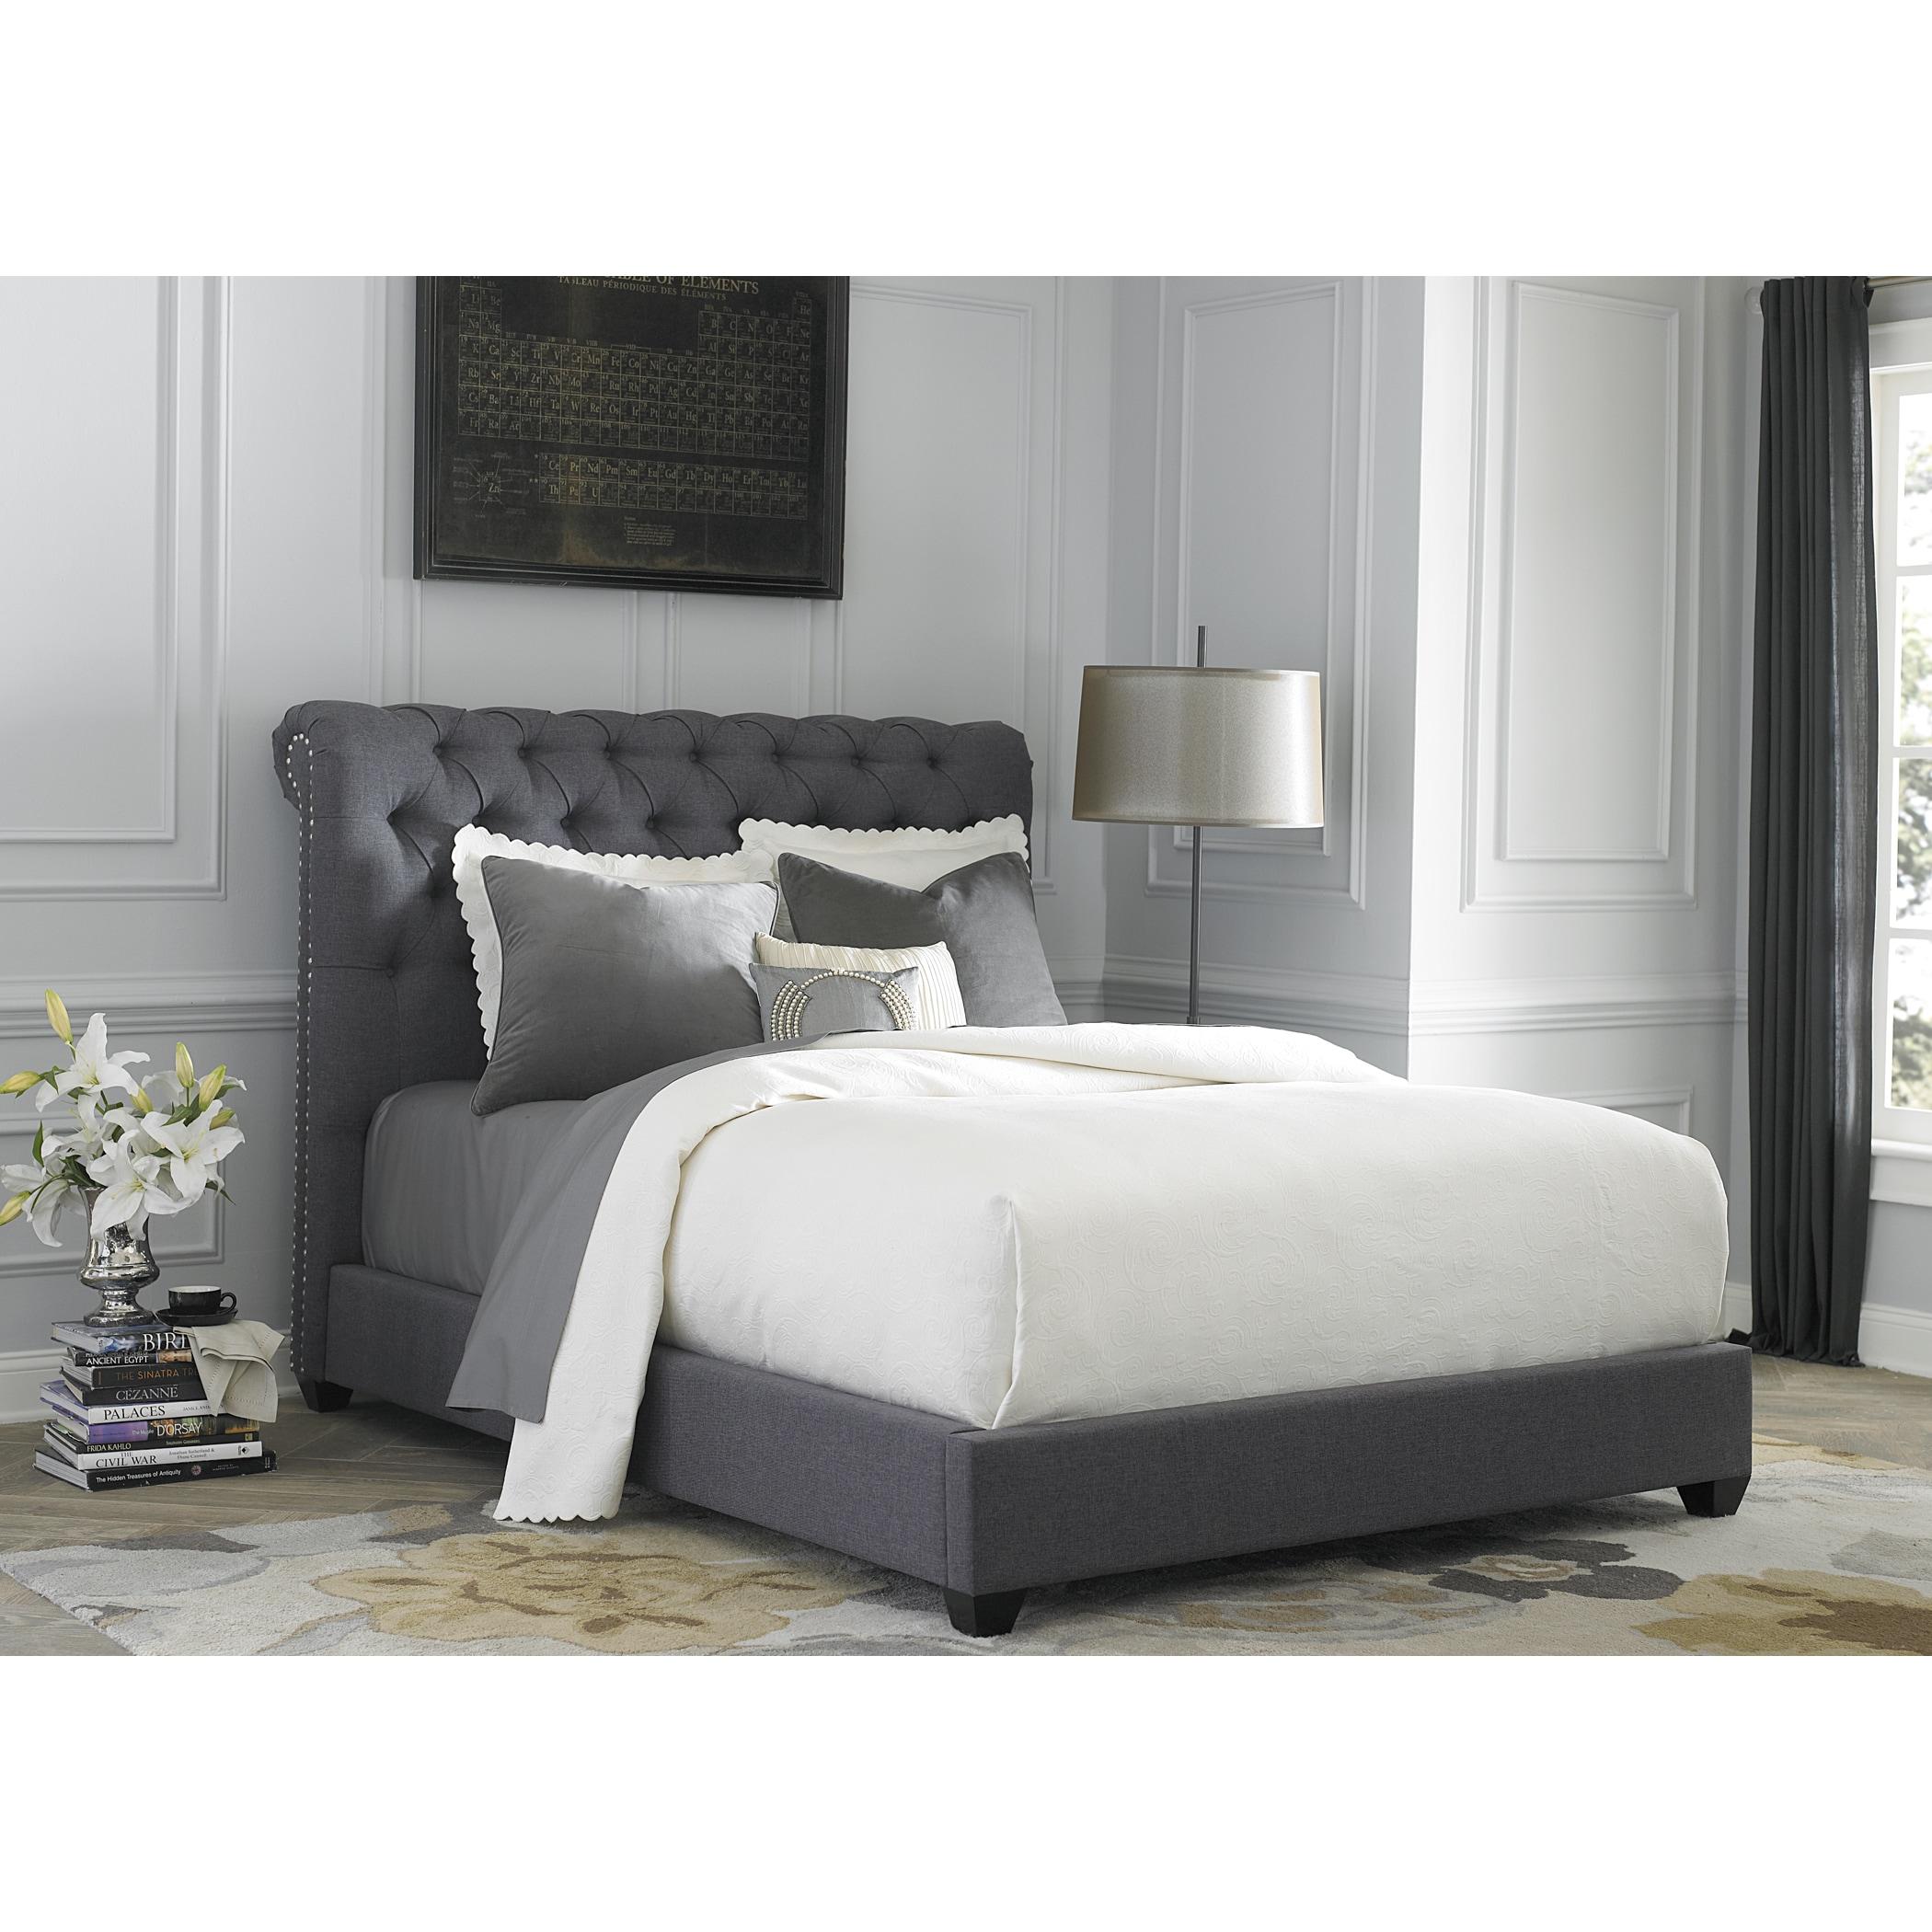 Liberty Dark Gray Linen Chesterfield Sleigh Upholstered B...